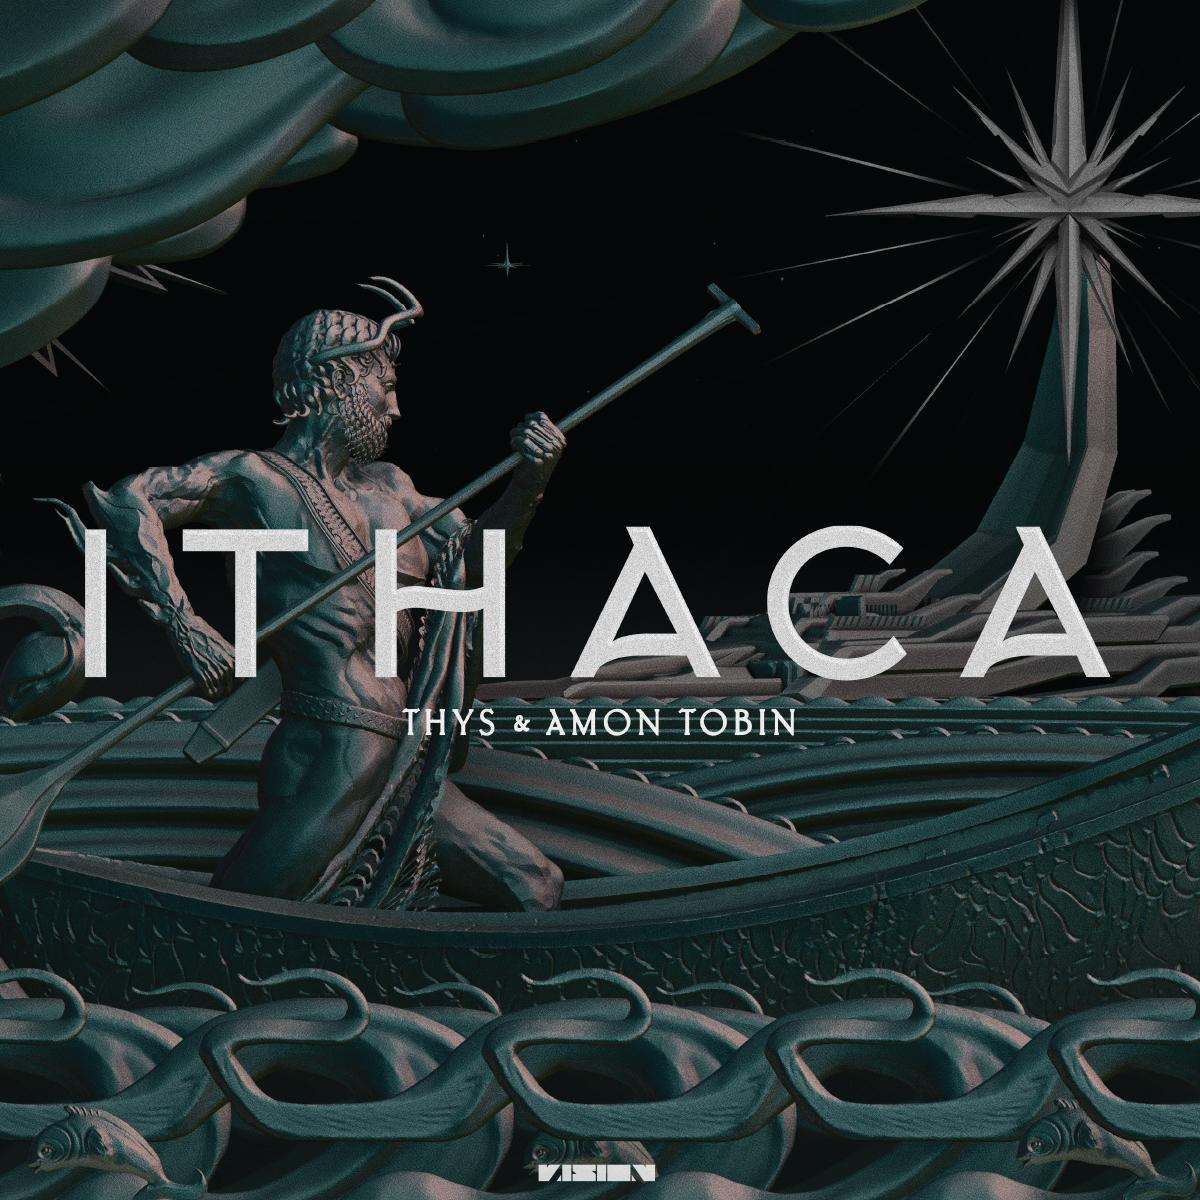 "Thys & Amon Tobin/ITHACA EP 12"""